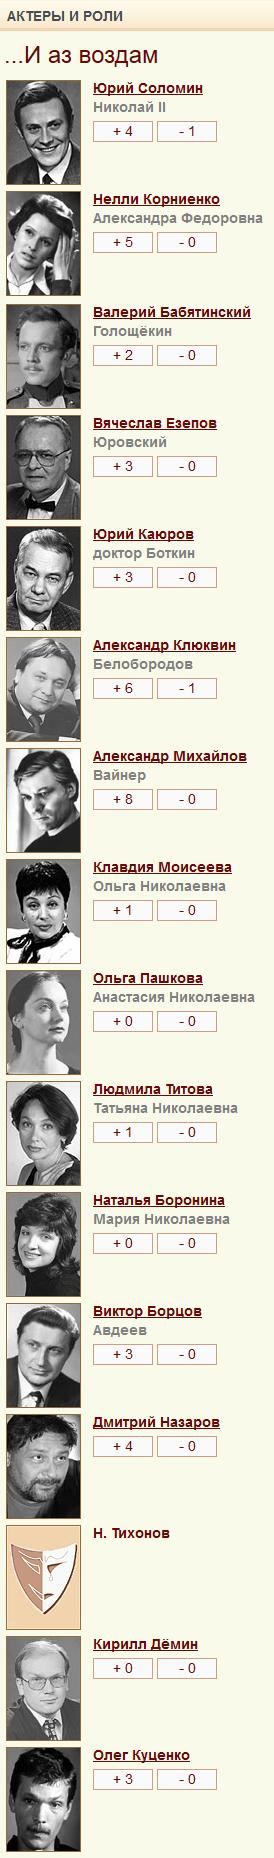 V-20160603_23-05-36-И аз воздам (1990)-актеры и роли-www_kino-teatr_ru